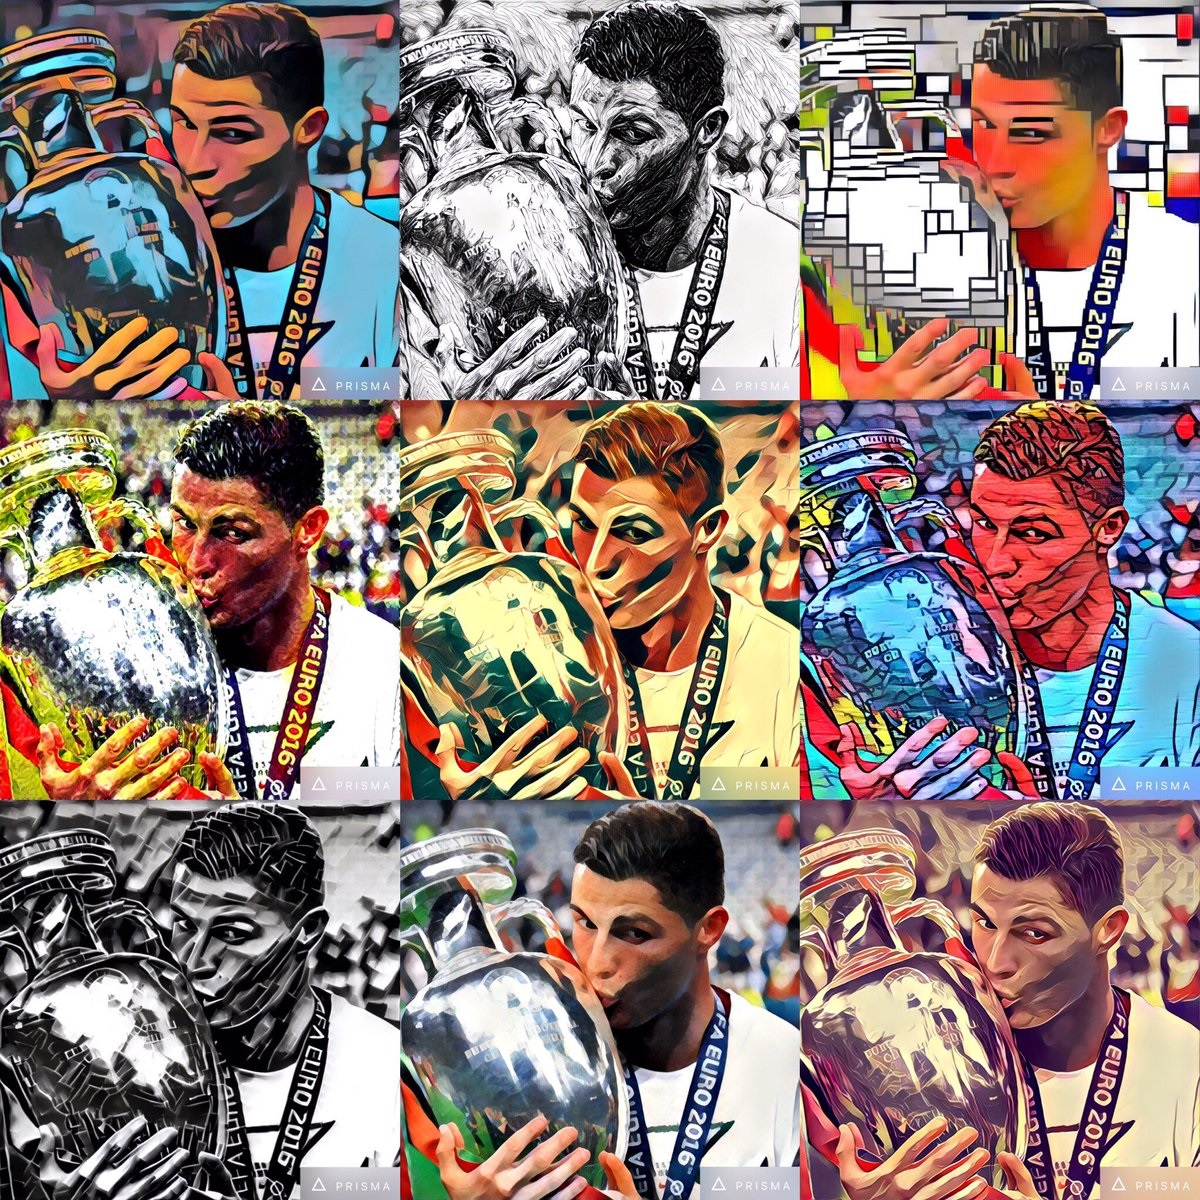 Ronaldo_2-Prisma.jpg